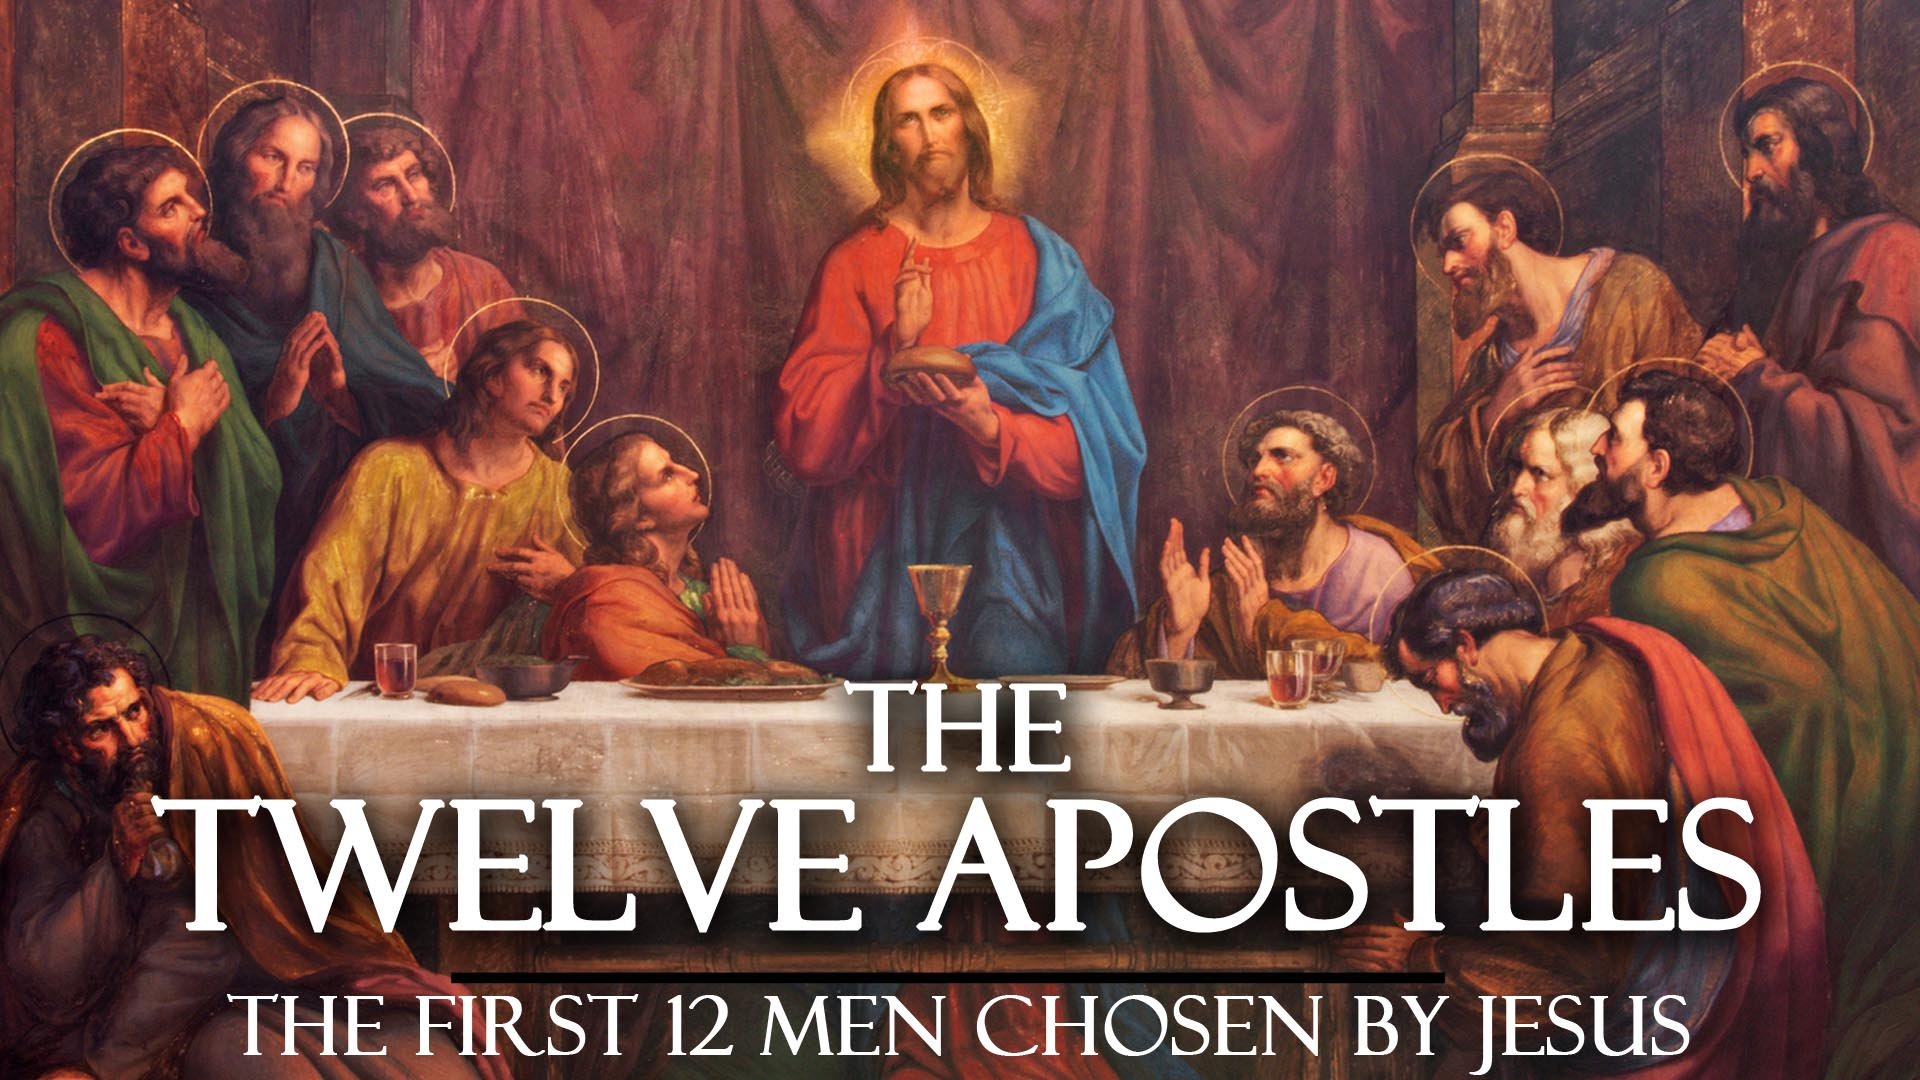 The Twelve Apostles: The First 12 Men Chosen By Jesus